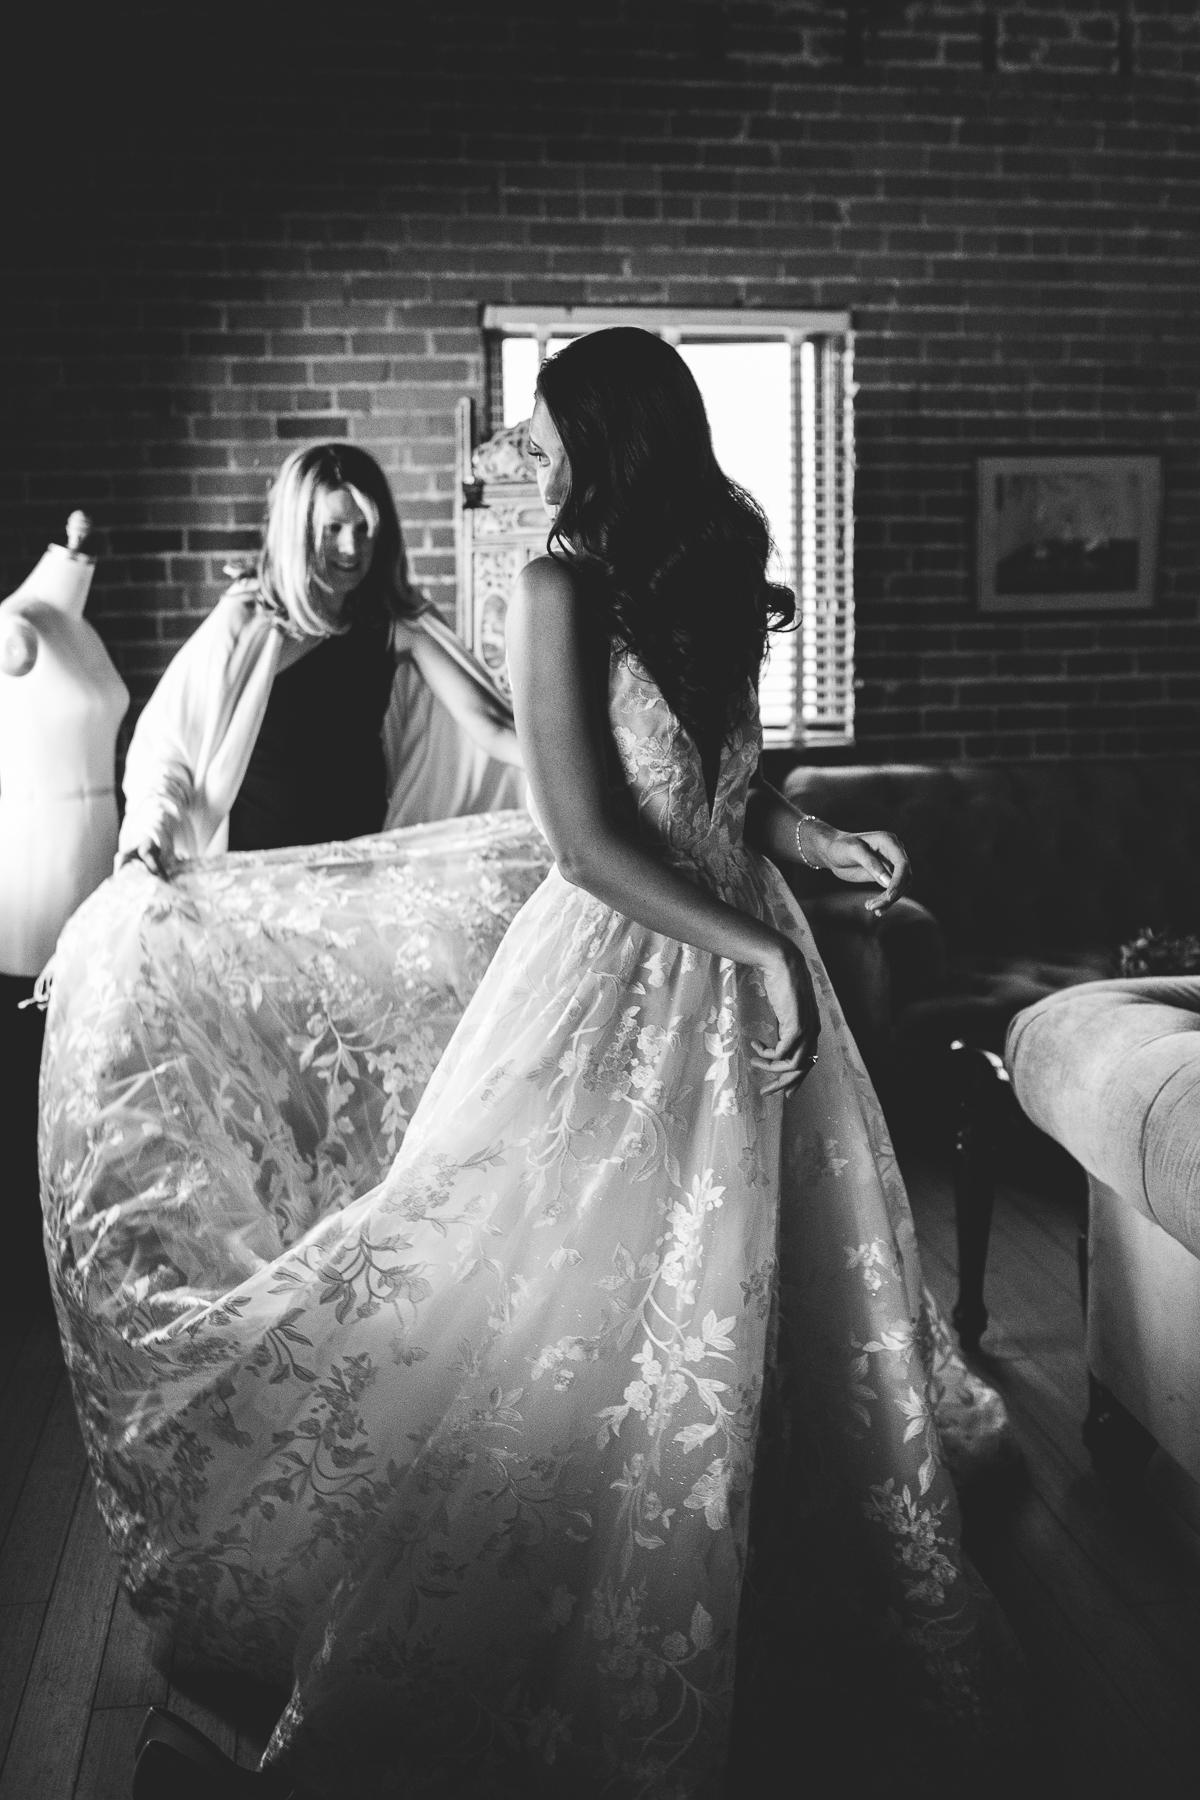 carondelet-house-kelley-raye-los-angeles-wedding-photographer-6.jpg